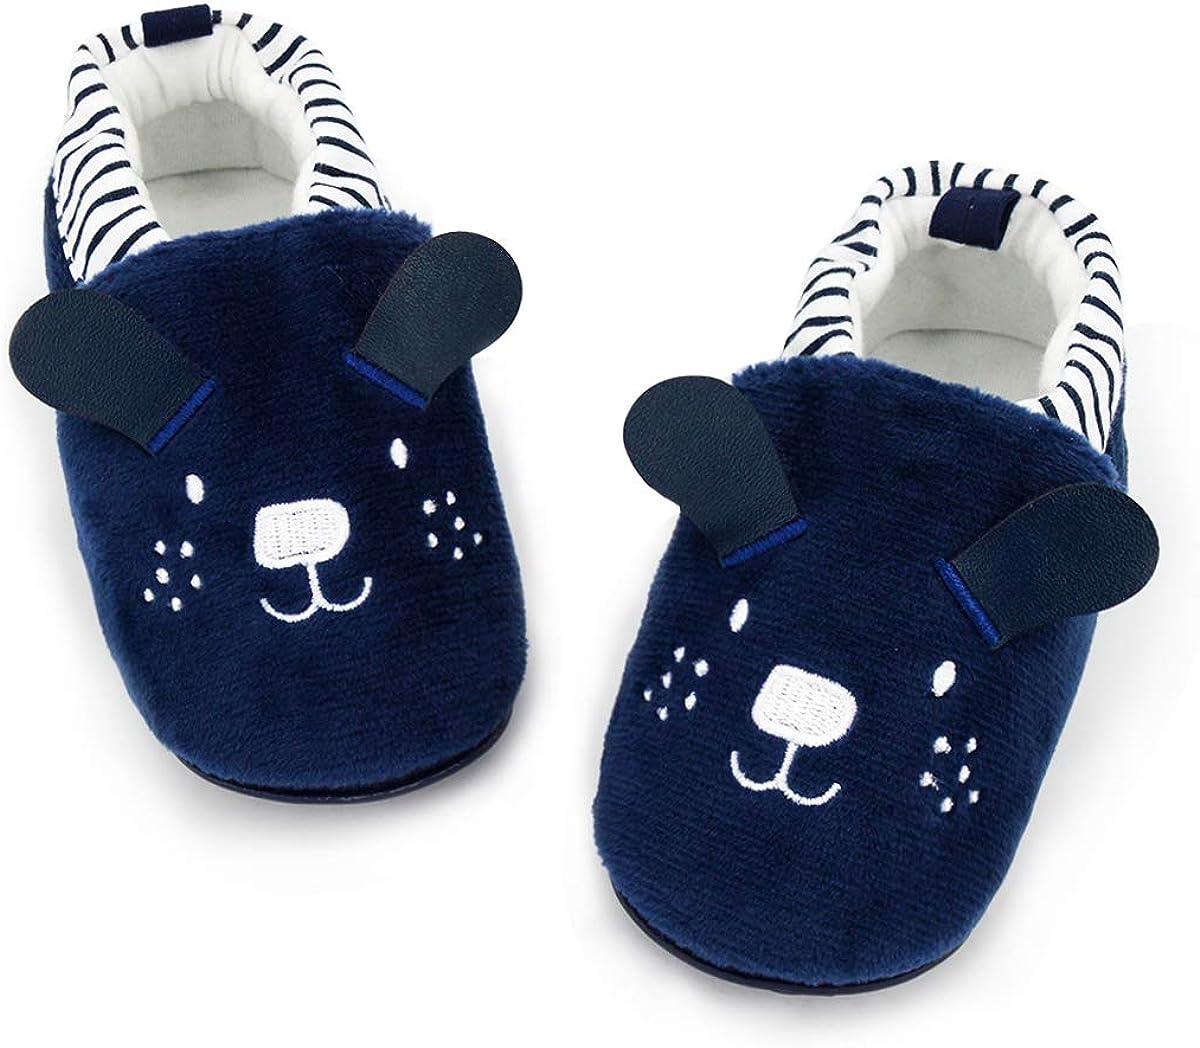 COSANKIM Infant Finally popular brand Sale special price Baby Boys Girls Slipper Soft Sole Skid Sneak Non